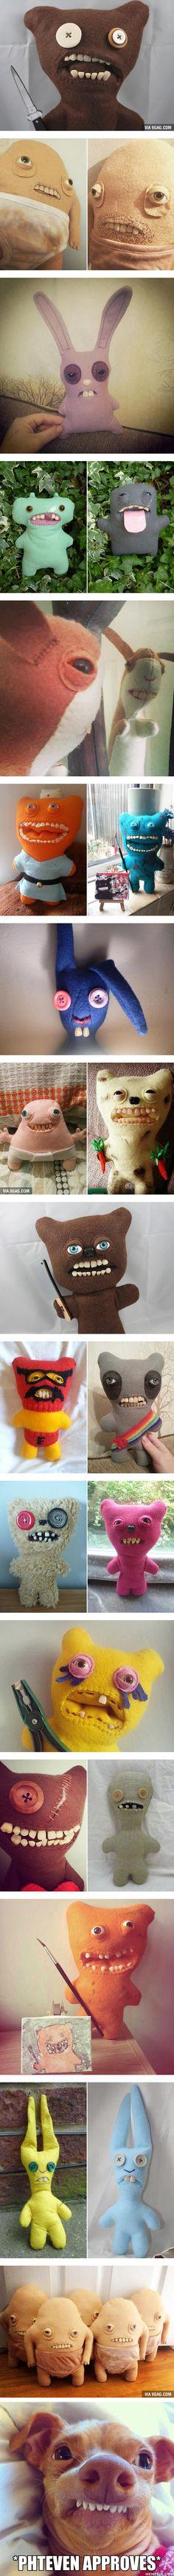 "Meet Fugglers: Stuffed Toys With ""Human Teeth"" (By Mrs McGettrick)   Disclosure: Not really human teeth just made to look like human teeth   Creepy Art   Weird"